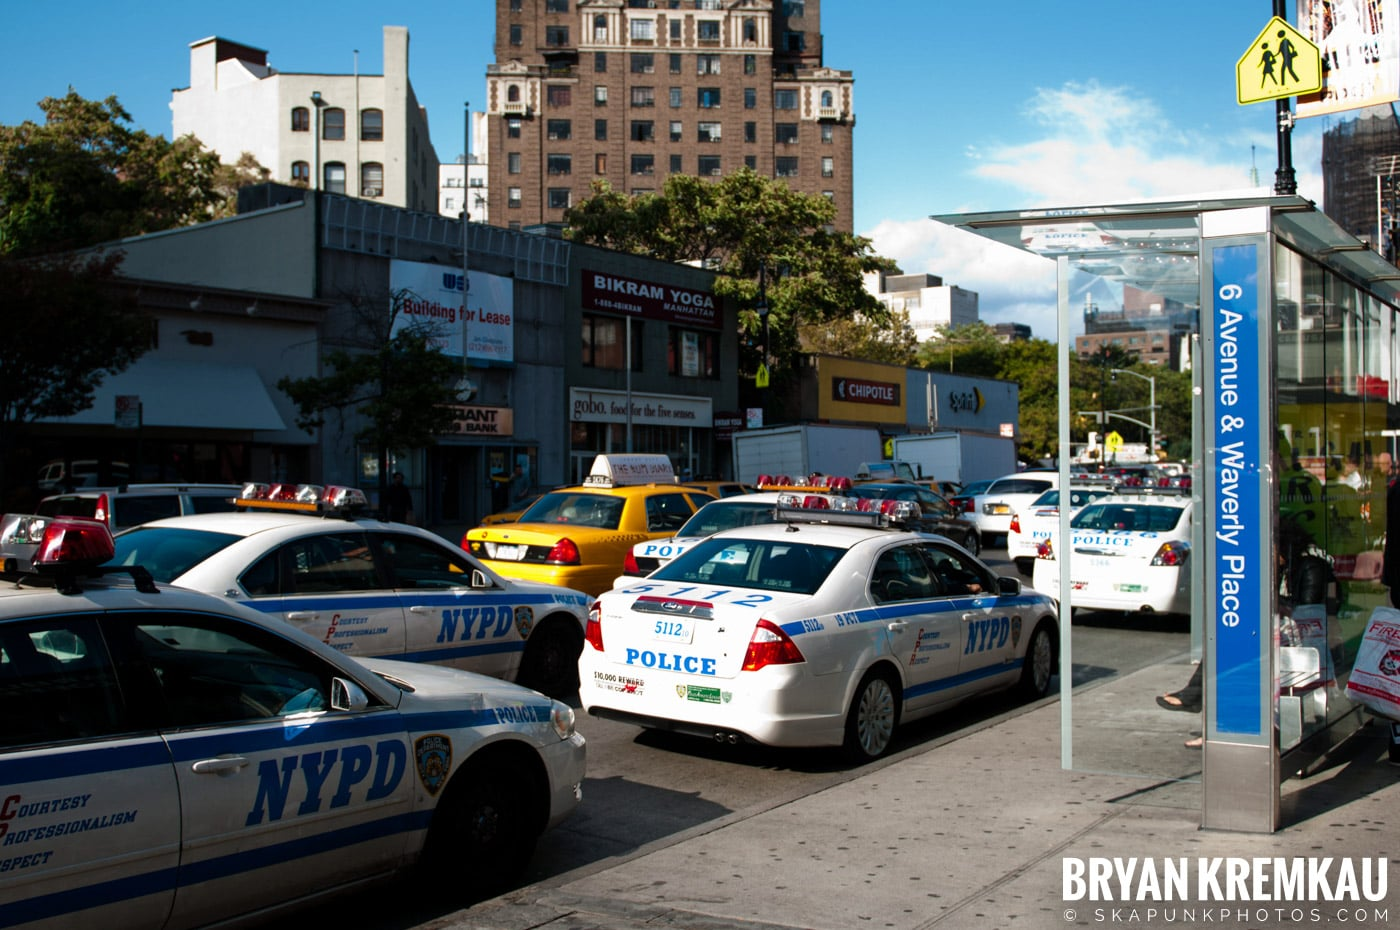 Occupy Wall Street @ Zuccotti Park and Washington Square Park, NYC - 10.15.11 (1)